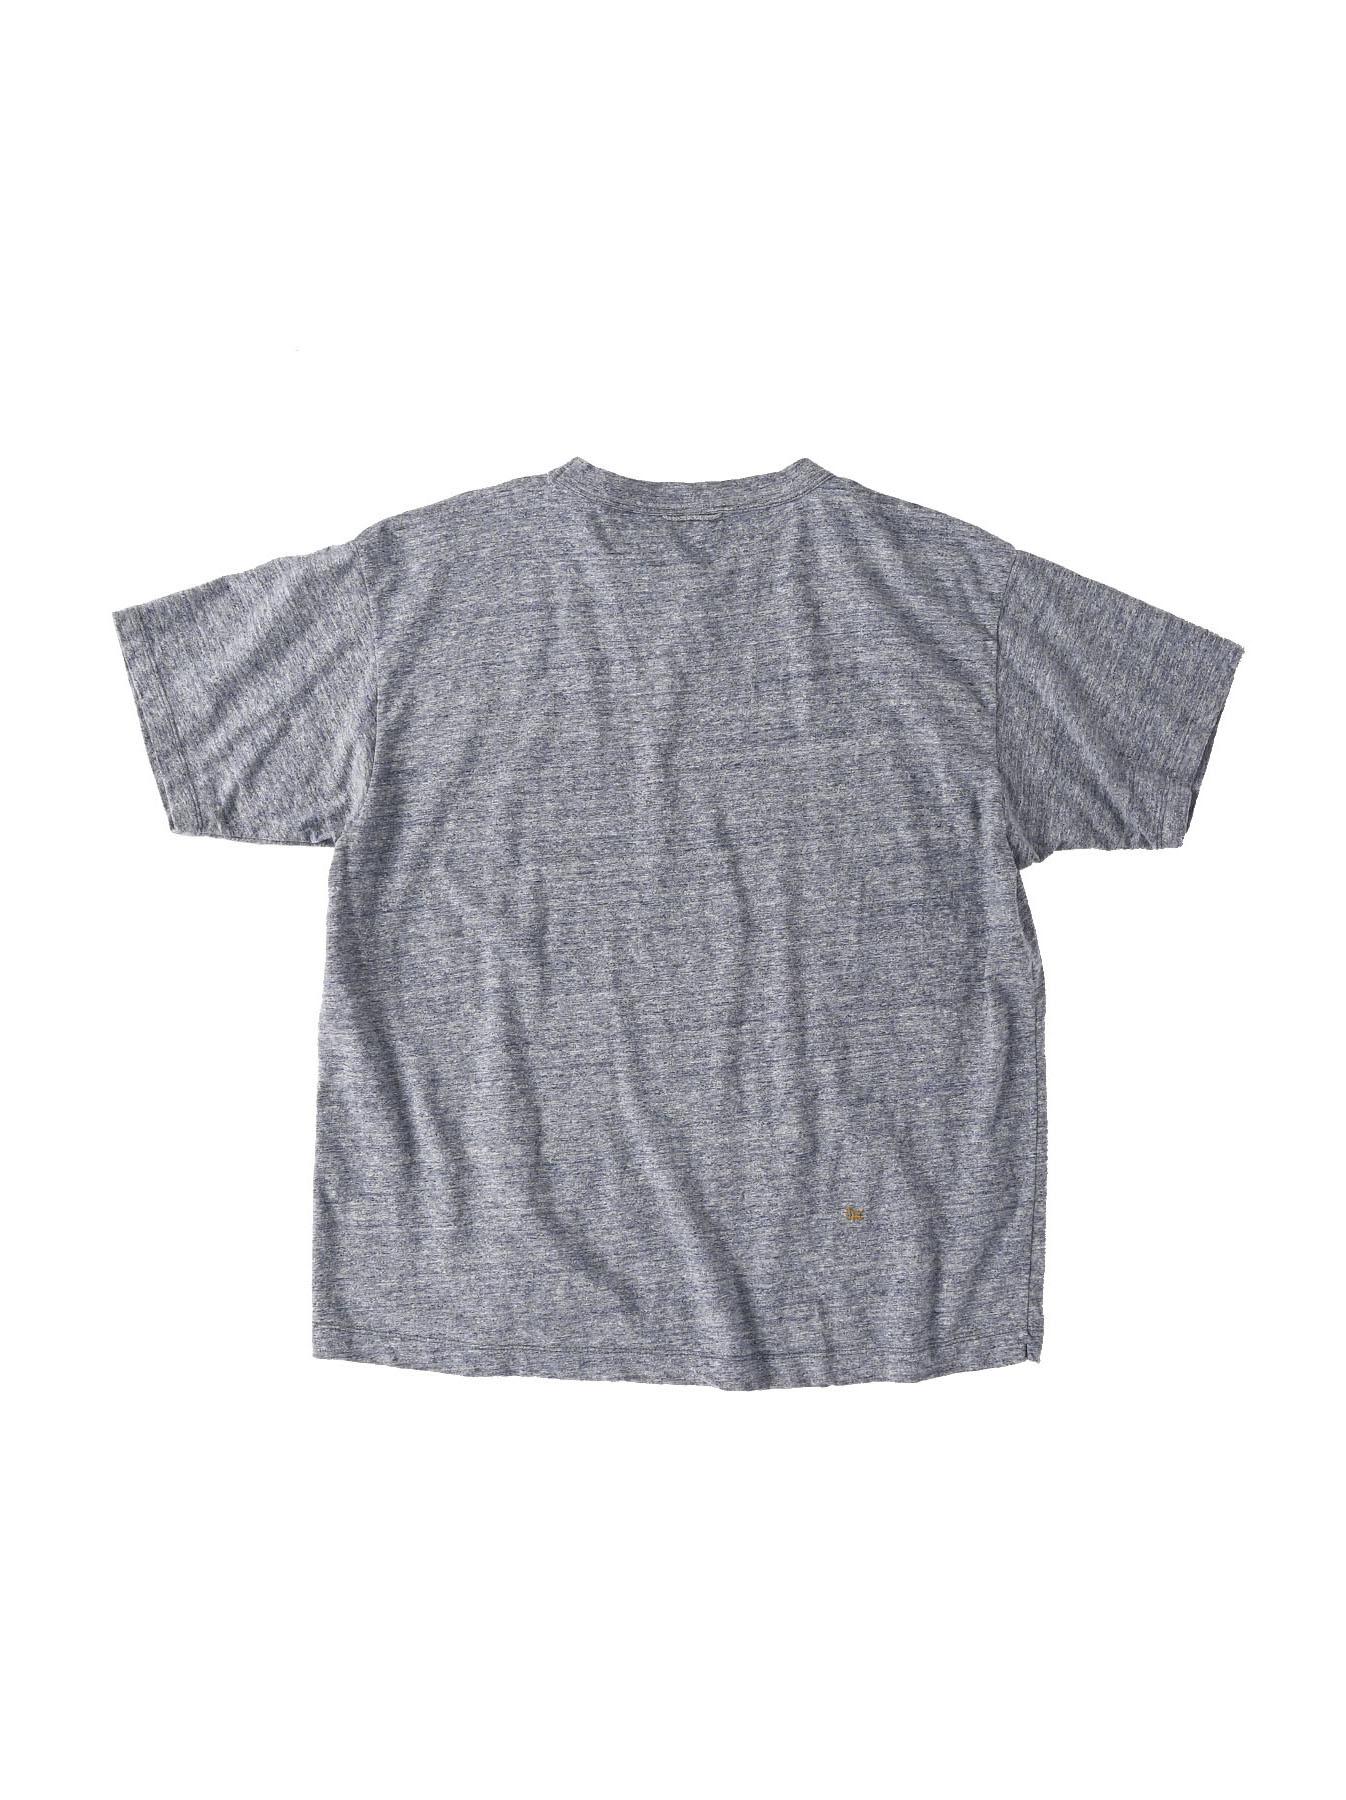 Top Sumite de Chicken T-shirt-9